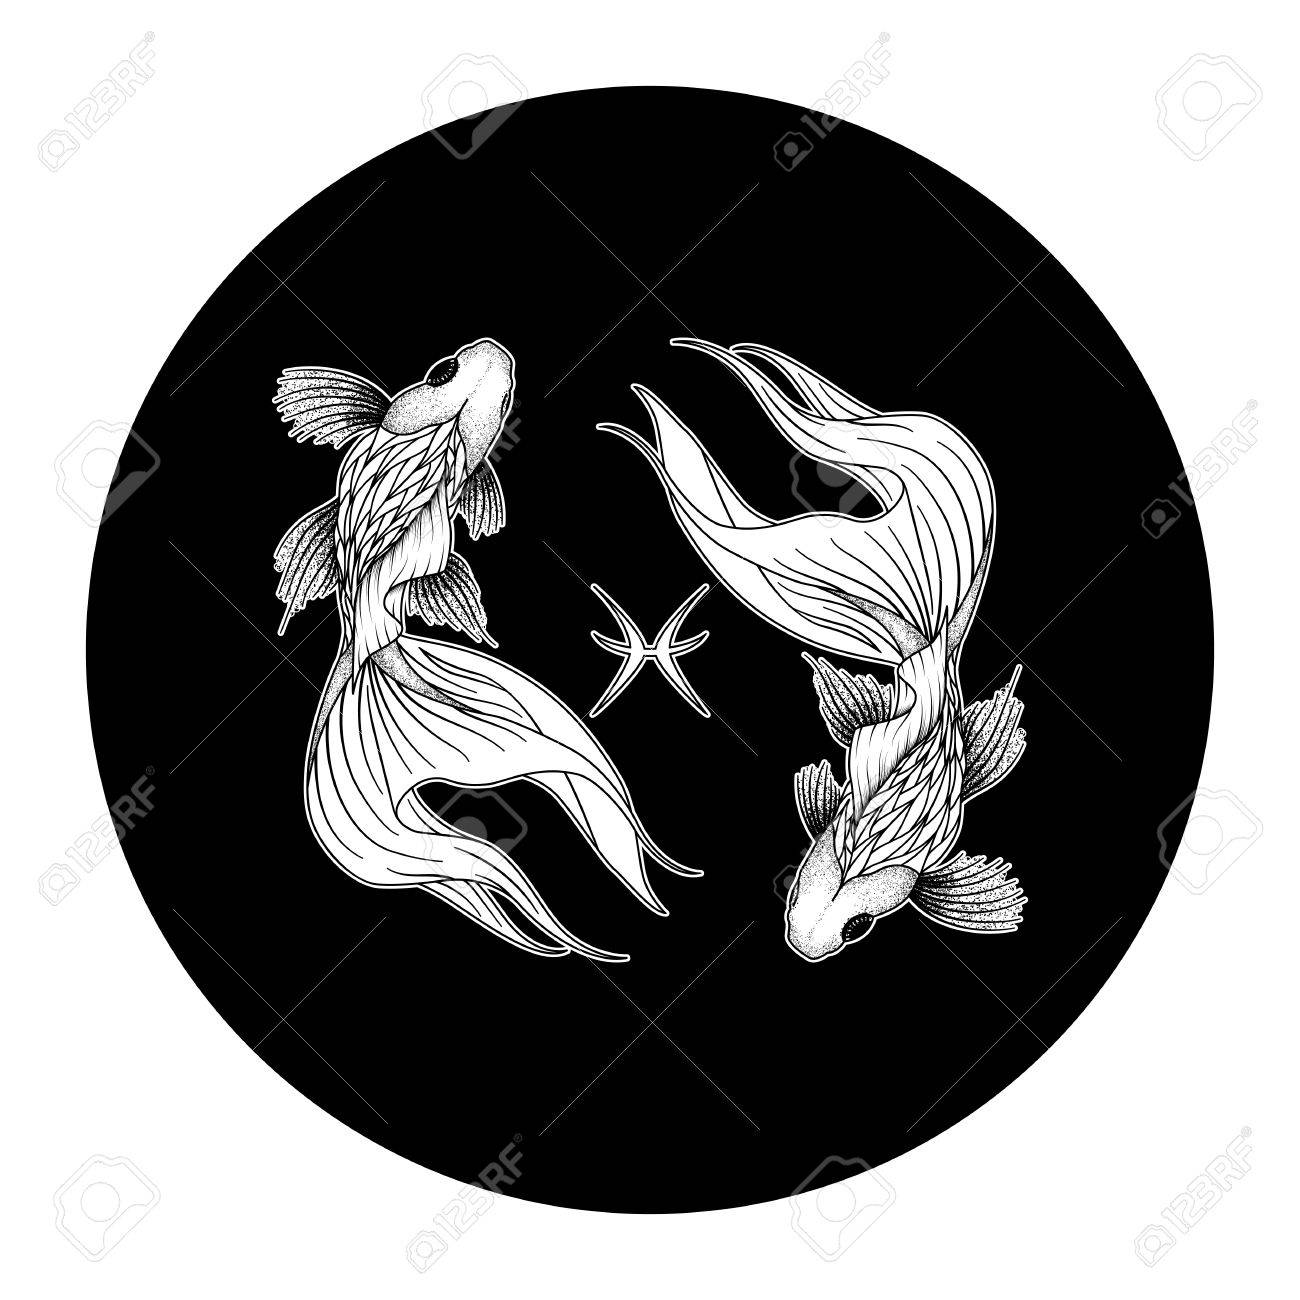 pisces horoscope symbols